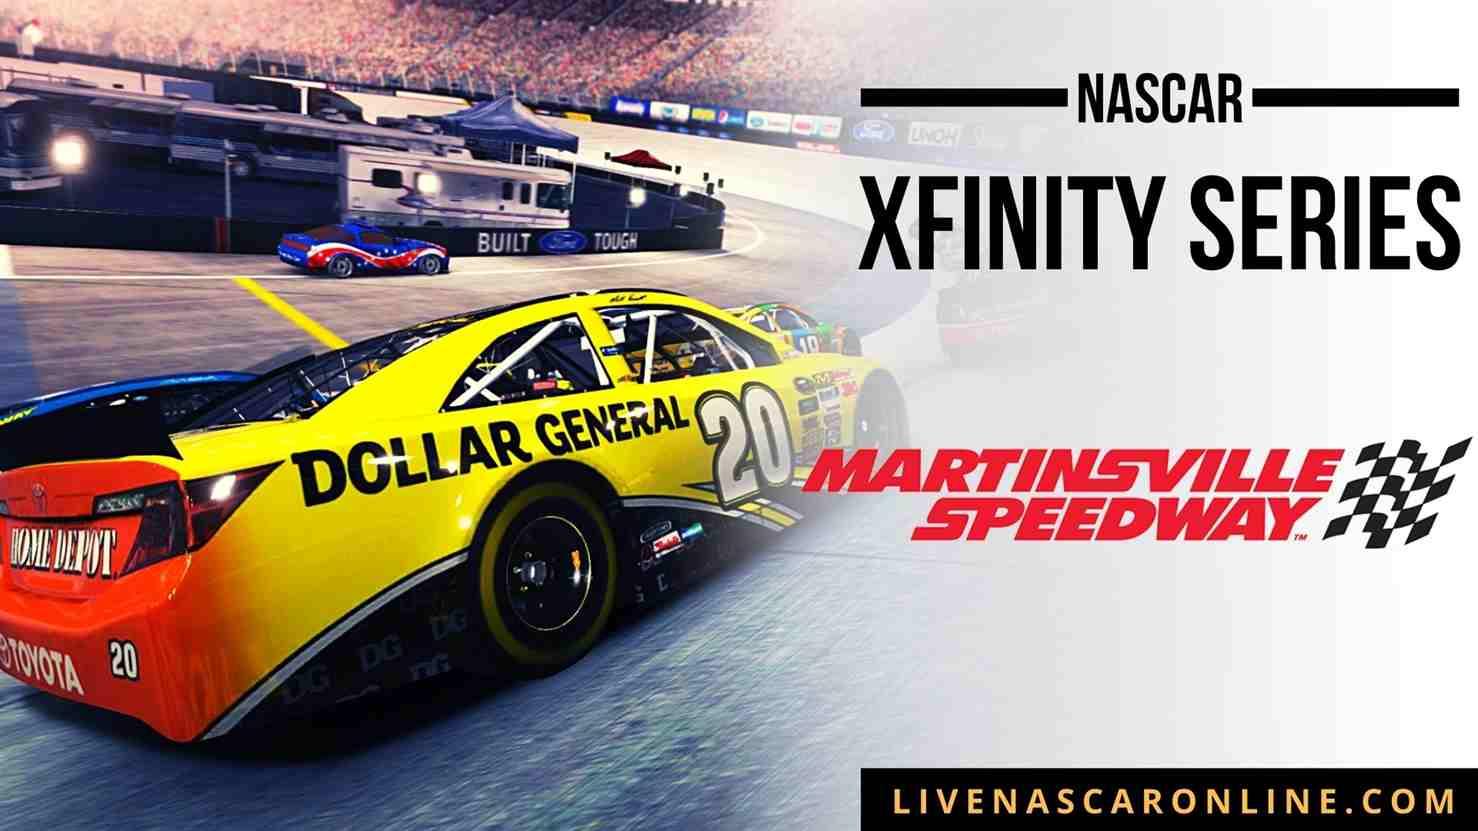 NASCAR Xfinity Race at Martinsville Live Stream 2021